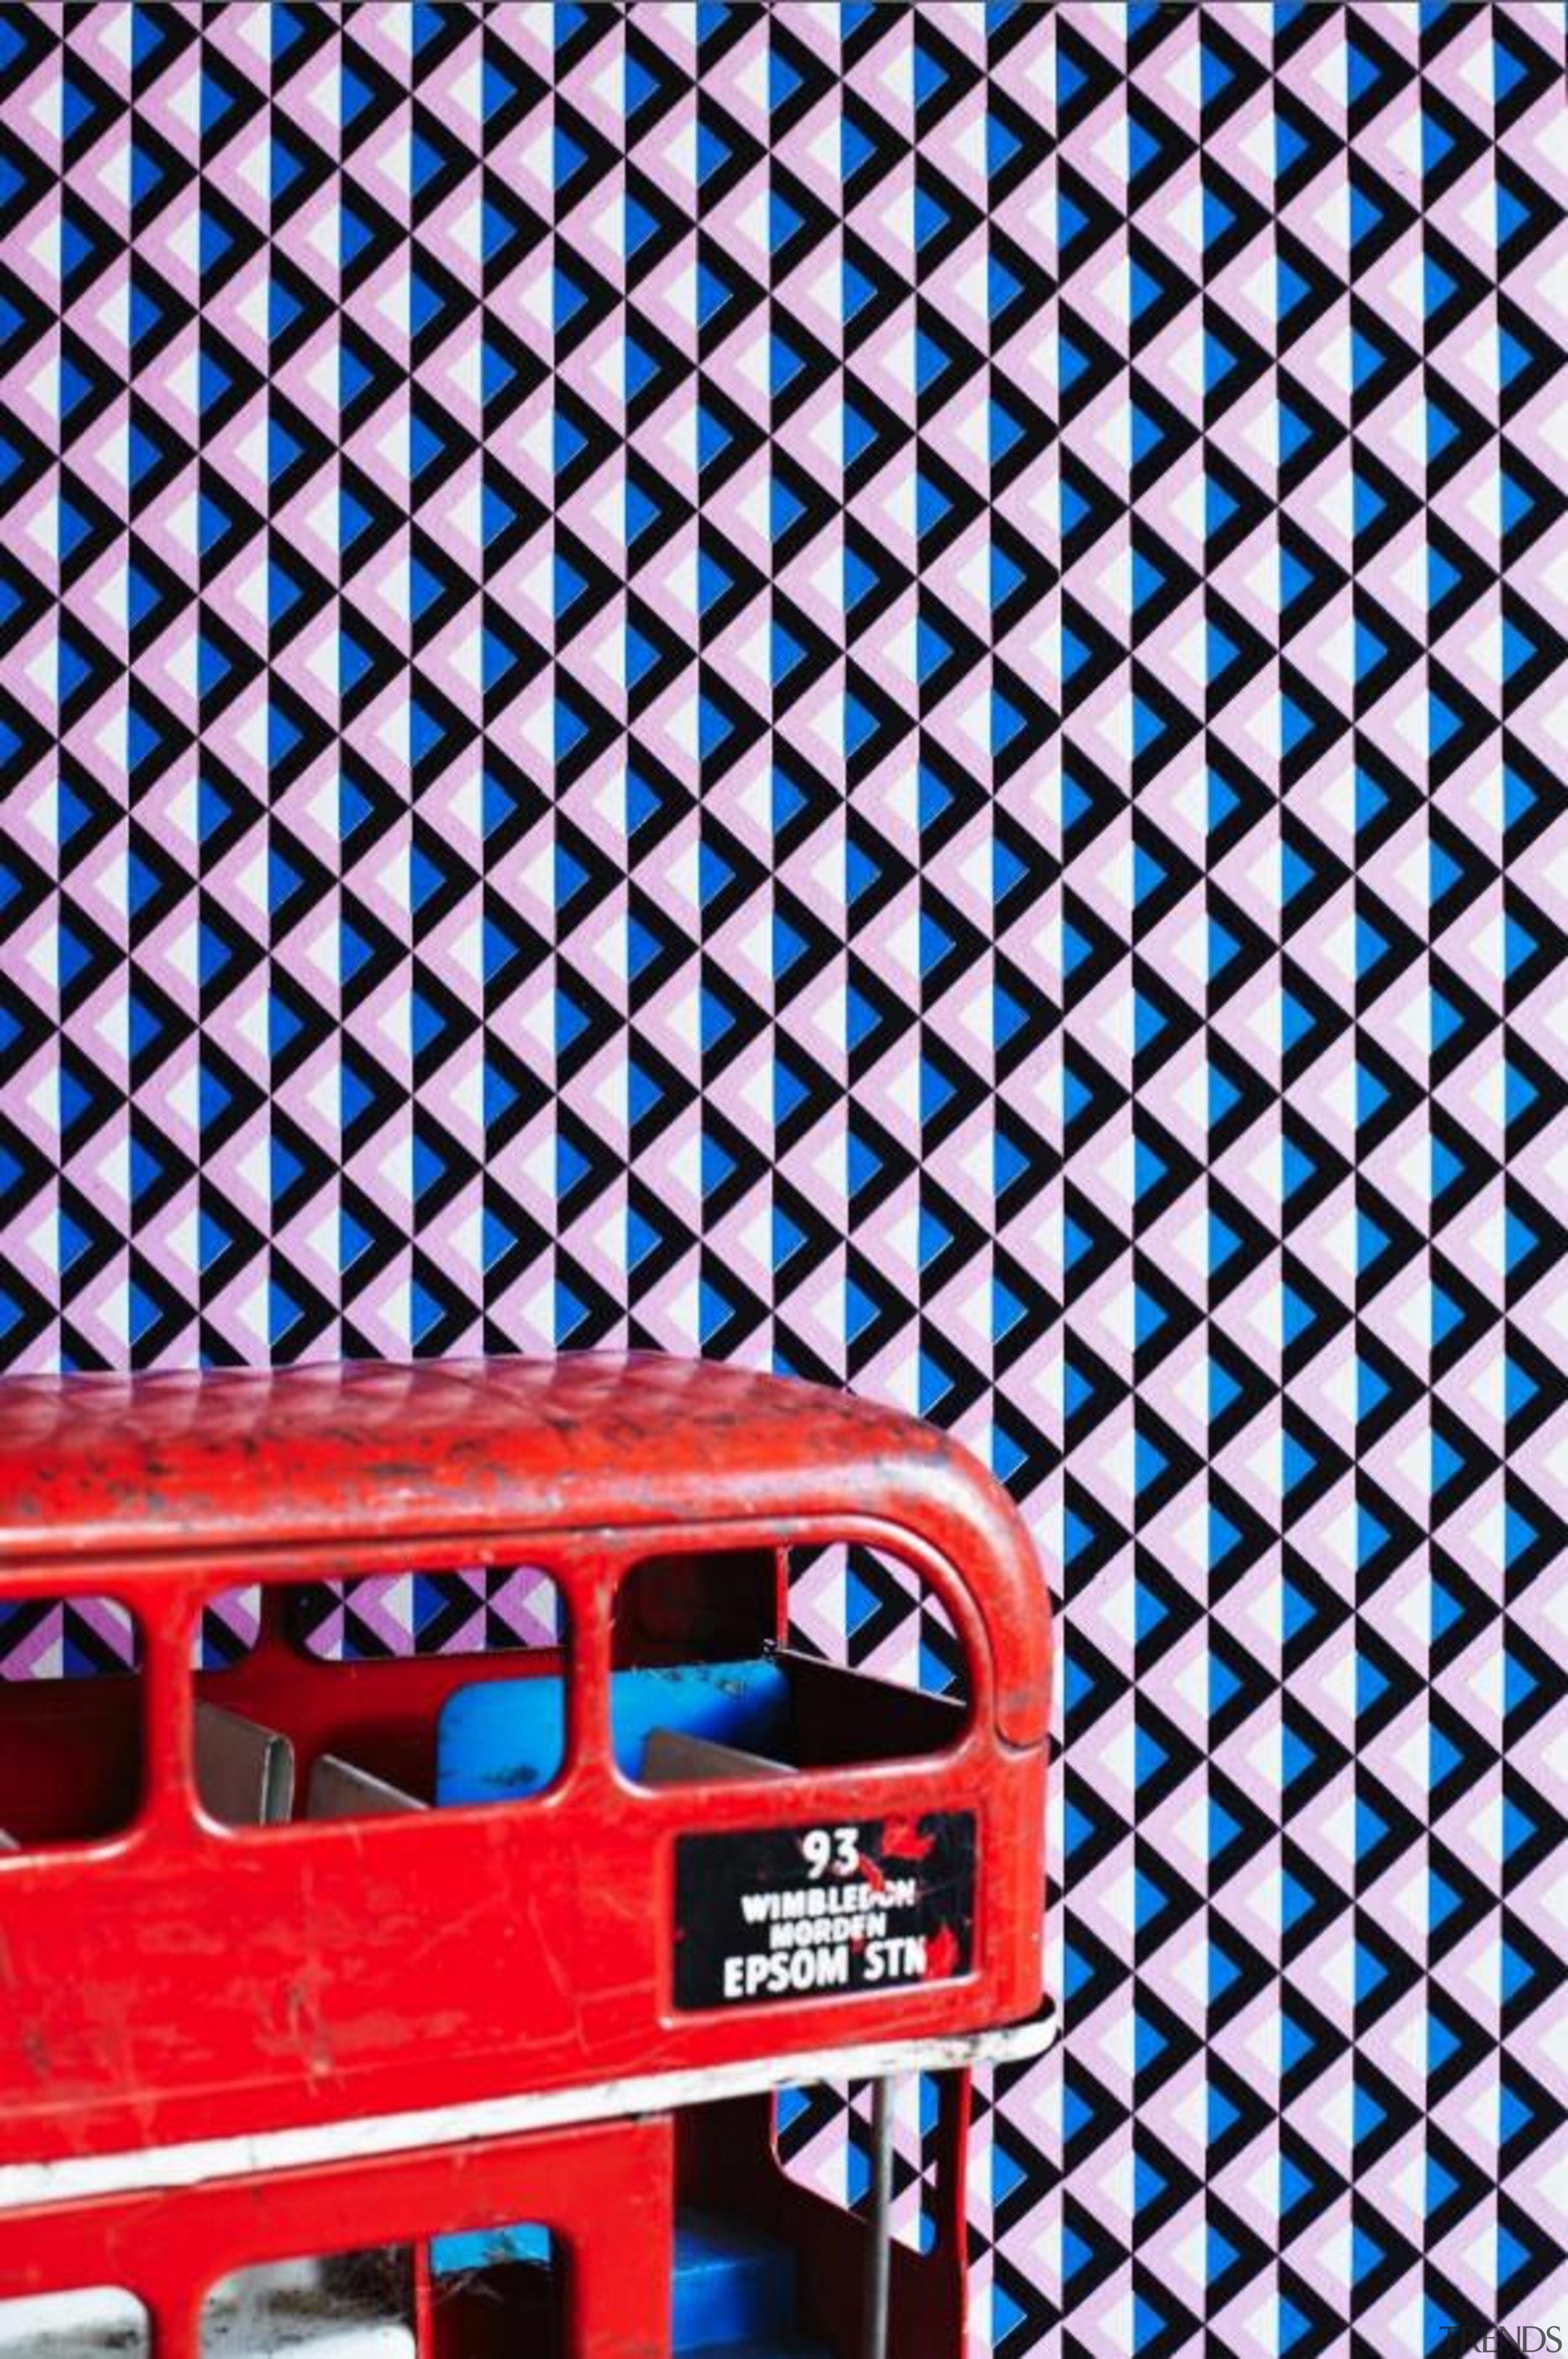 Eley Kishimoto Hand-Printed Wallpaper Collection - Eley Kishimoto blue, design, font, line, mesh, pattern, red, text